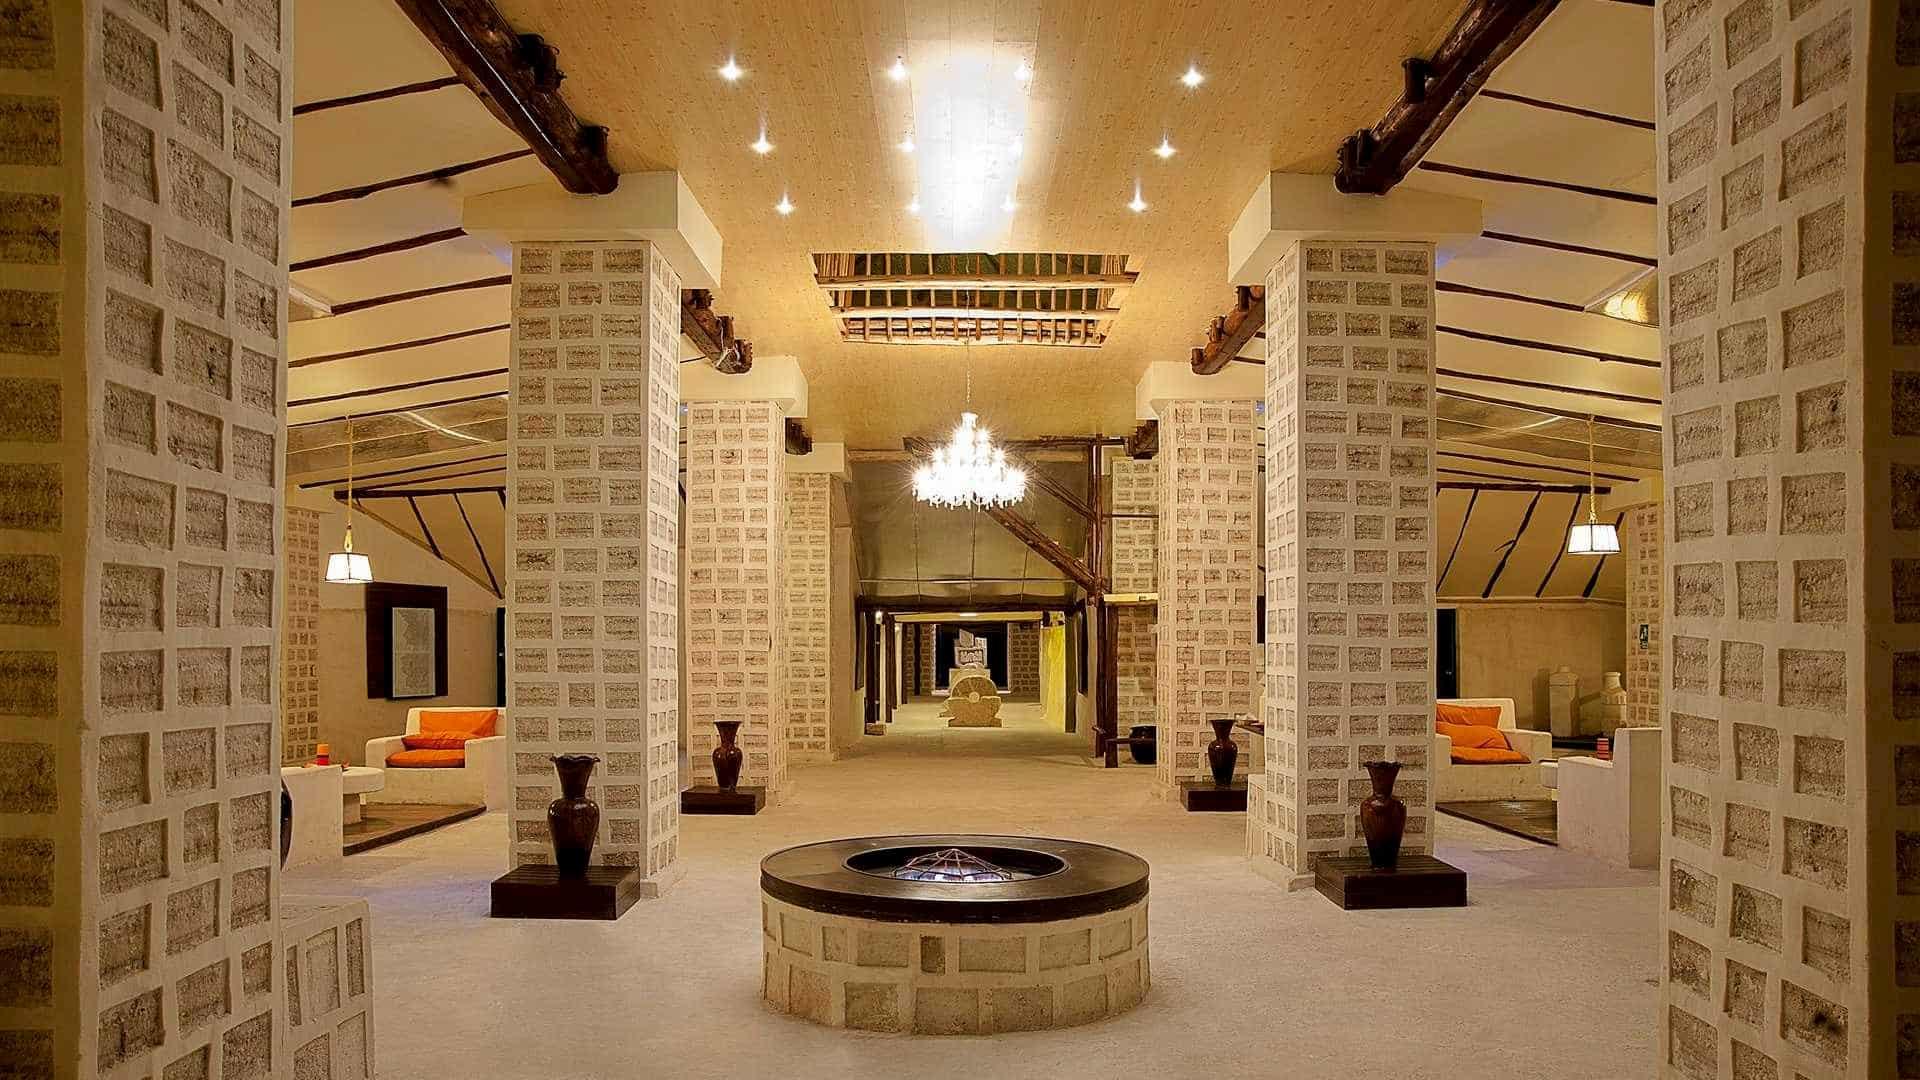 Palacio-de-Sal-resort-viaggio-di-nozze-Bolivia-2